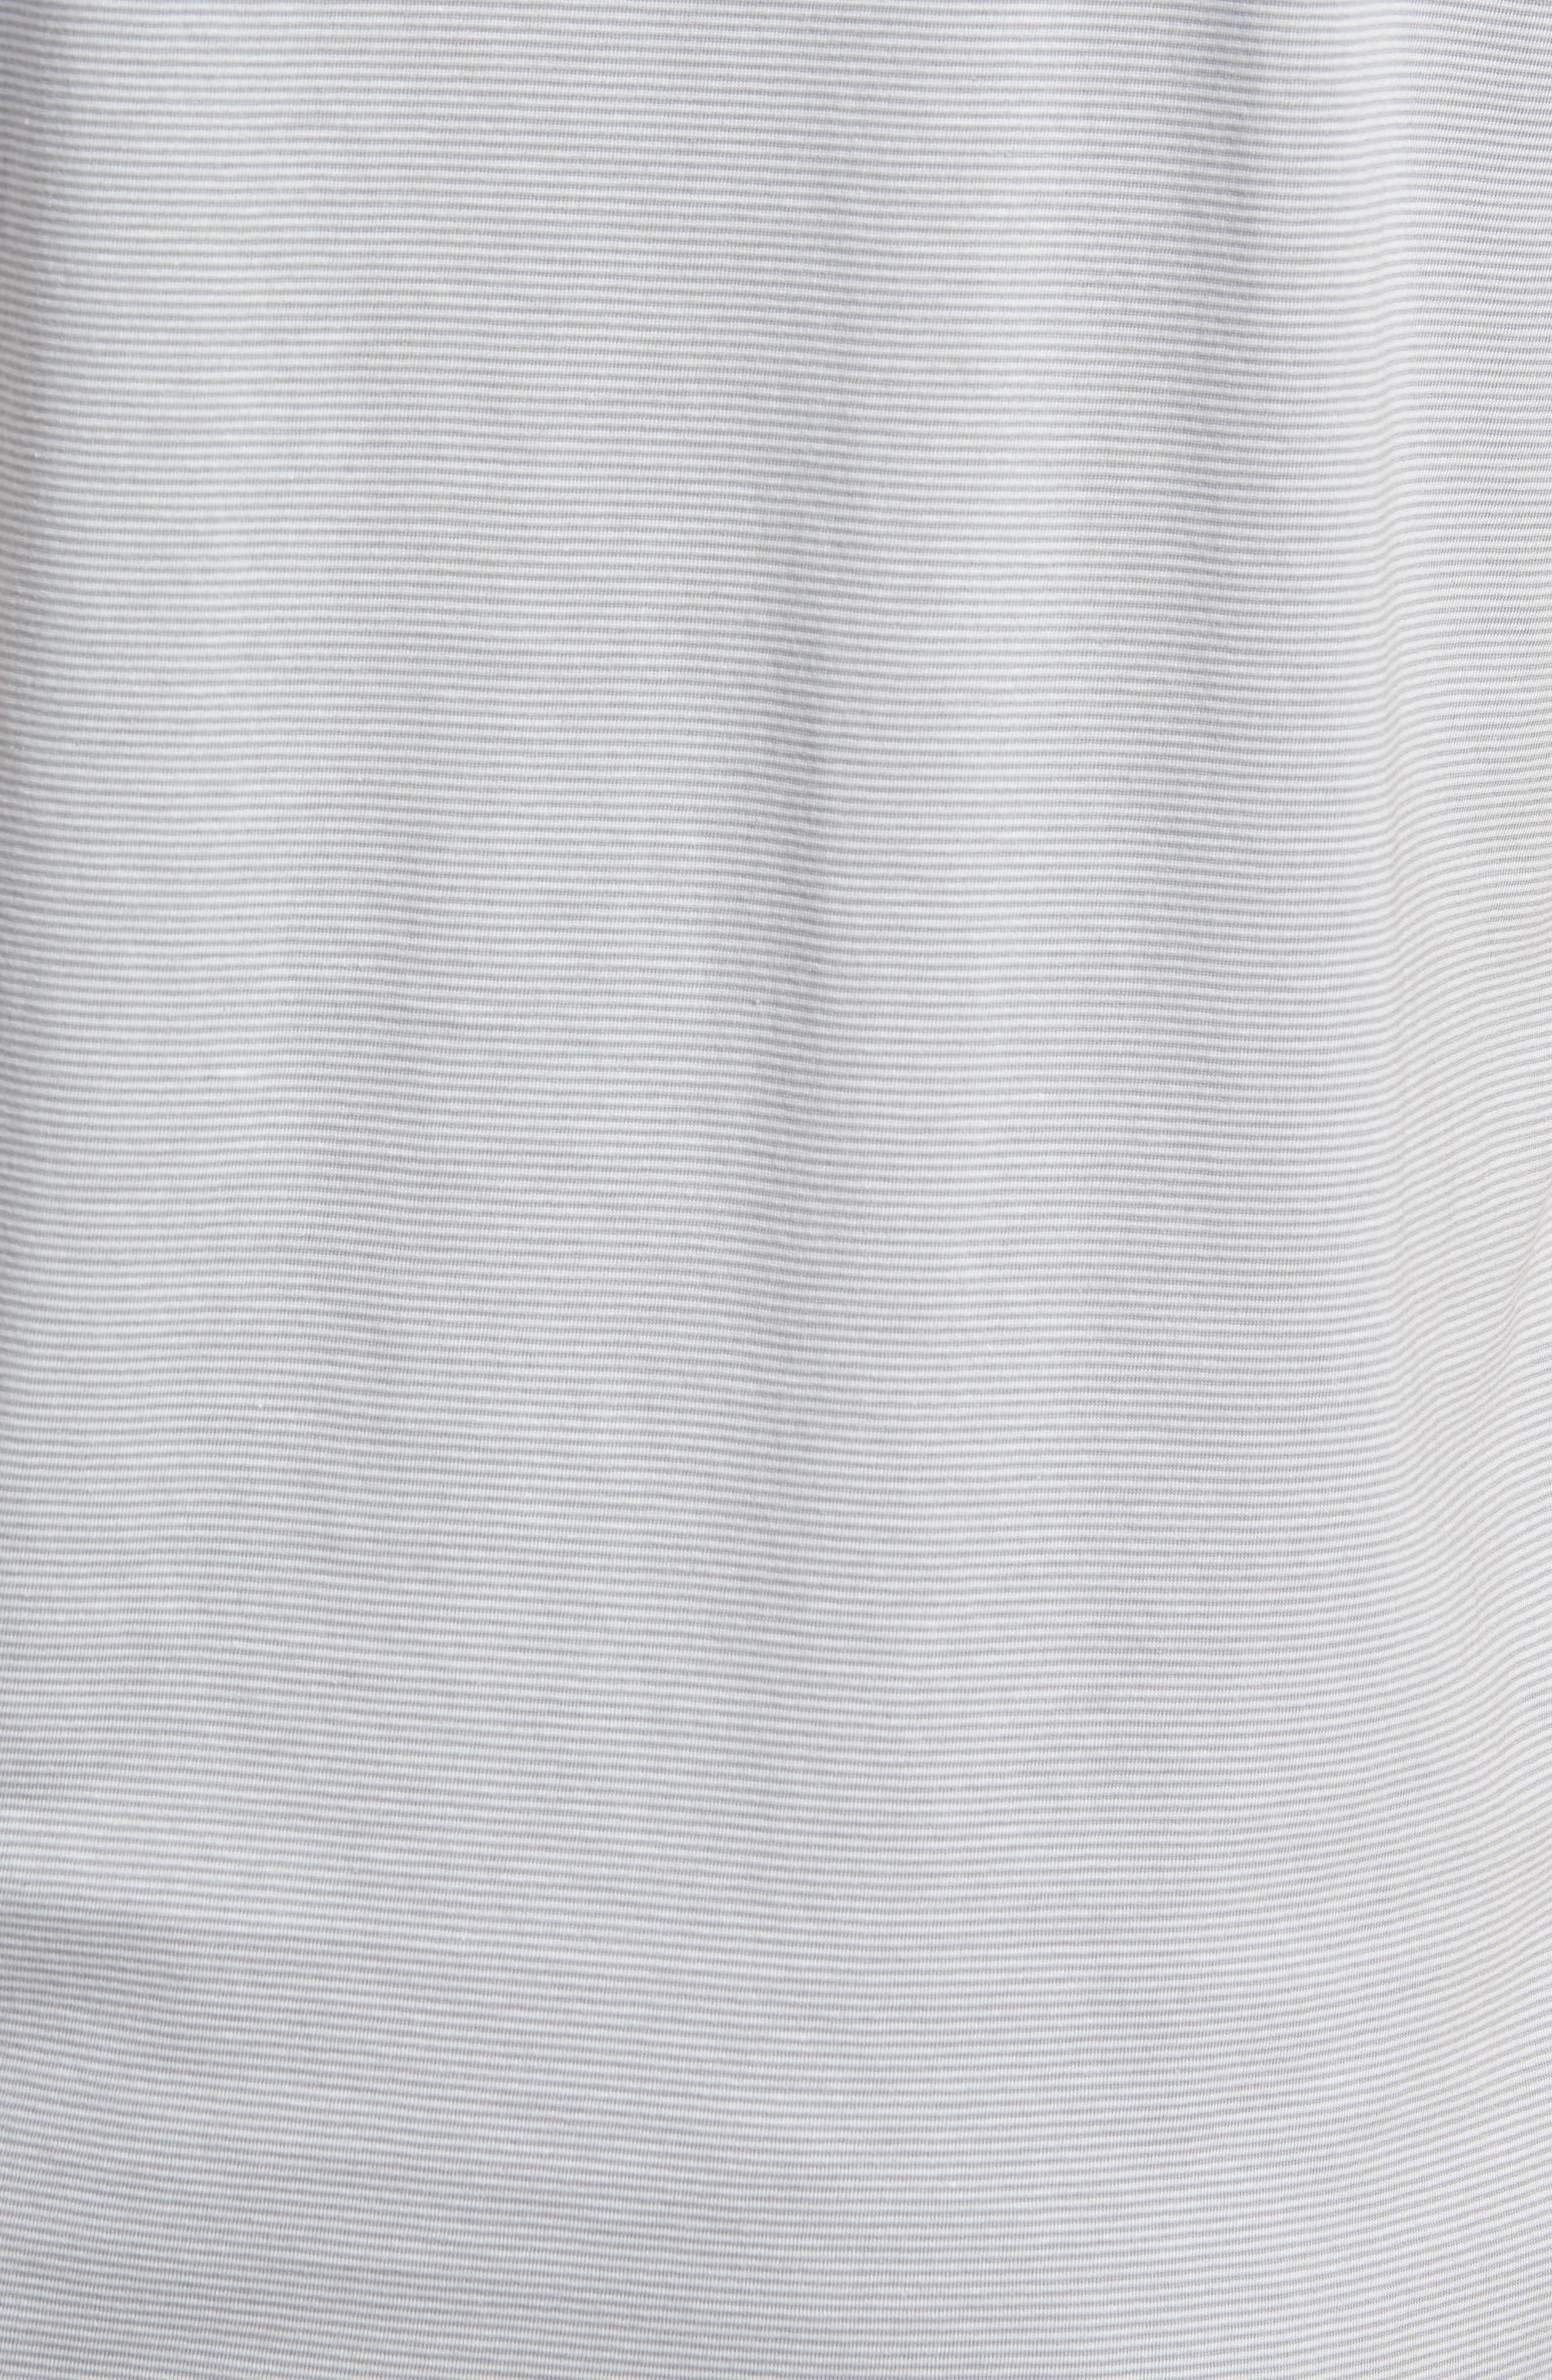 Refined Slim Fit T-Shirt,                             Alternate thumbnail 5, color,                             020